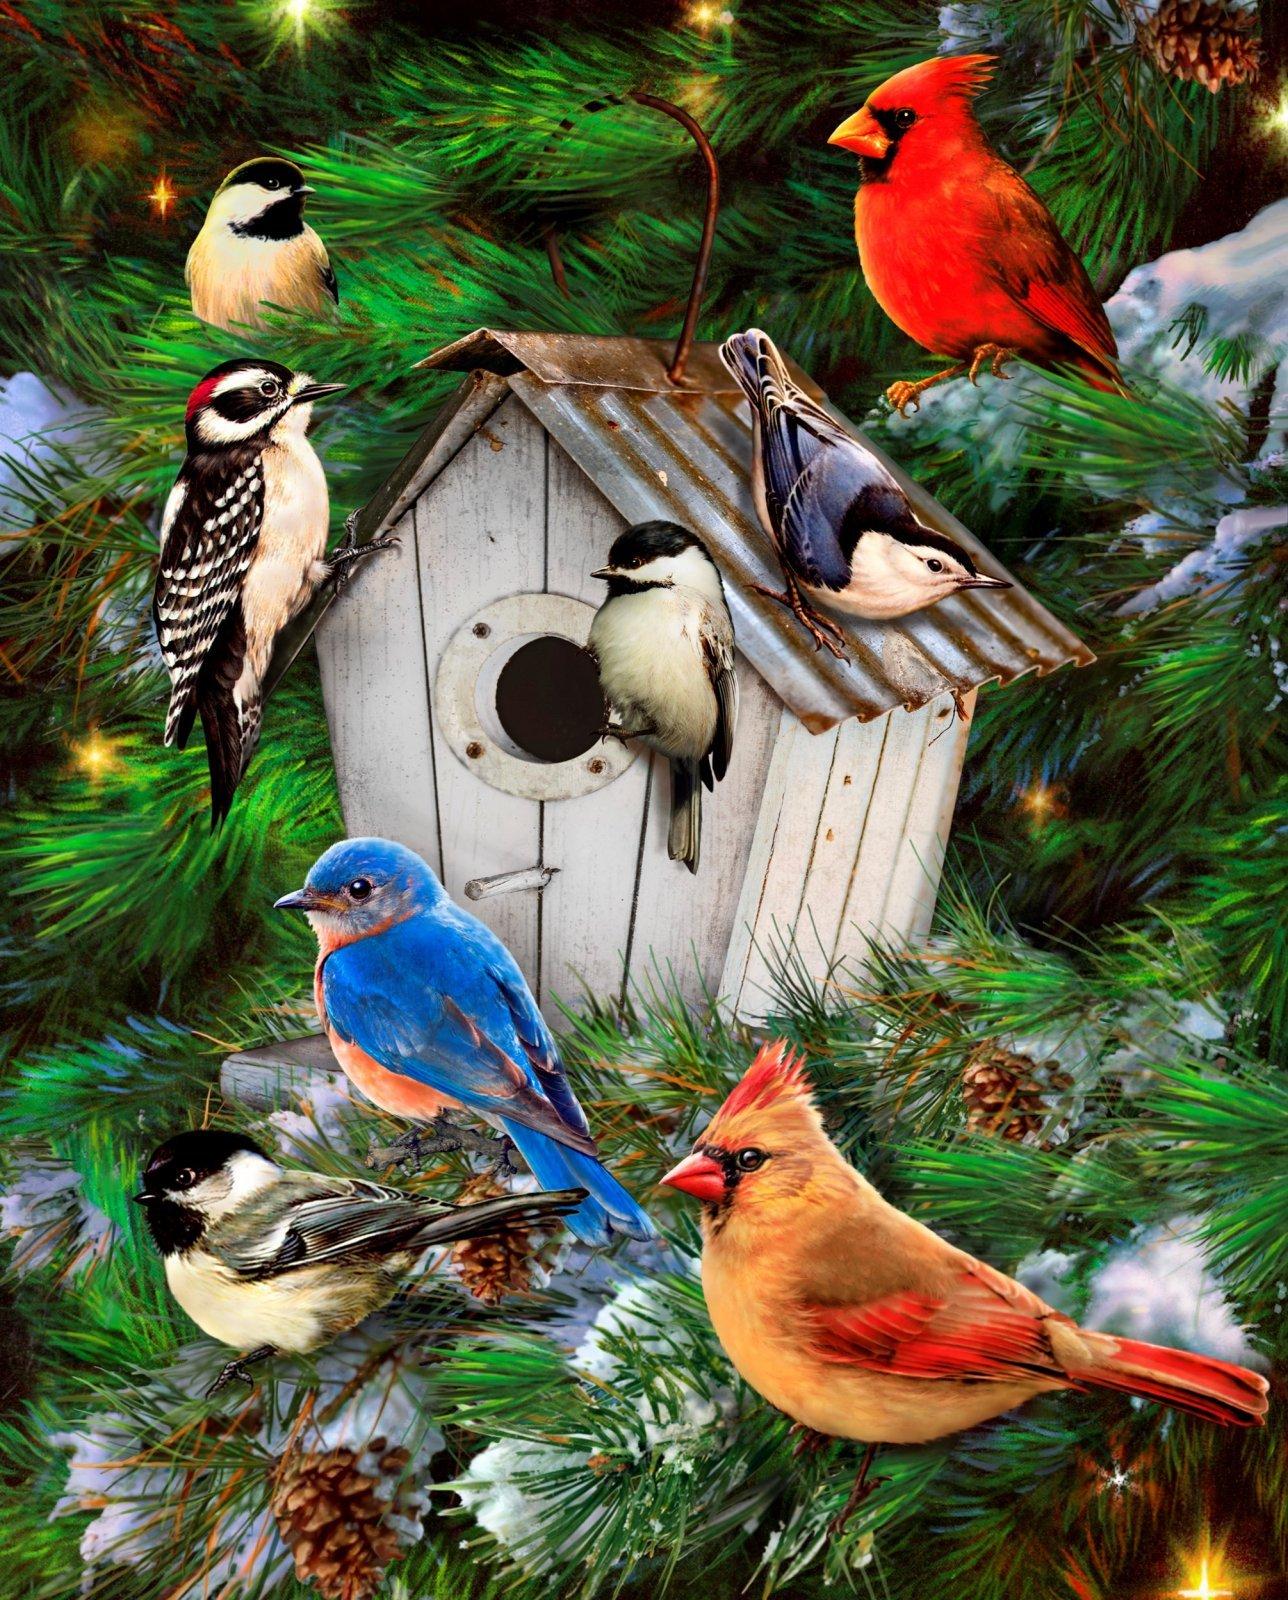 Pine Tree Bird House 0027 Panel